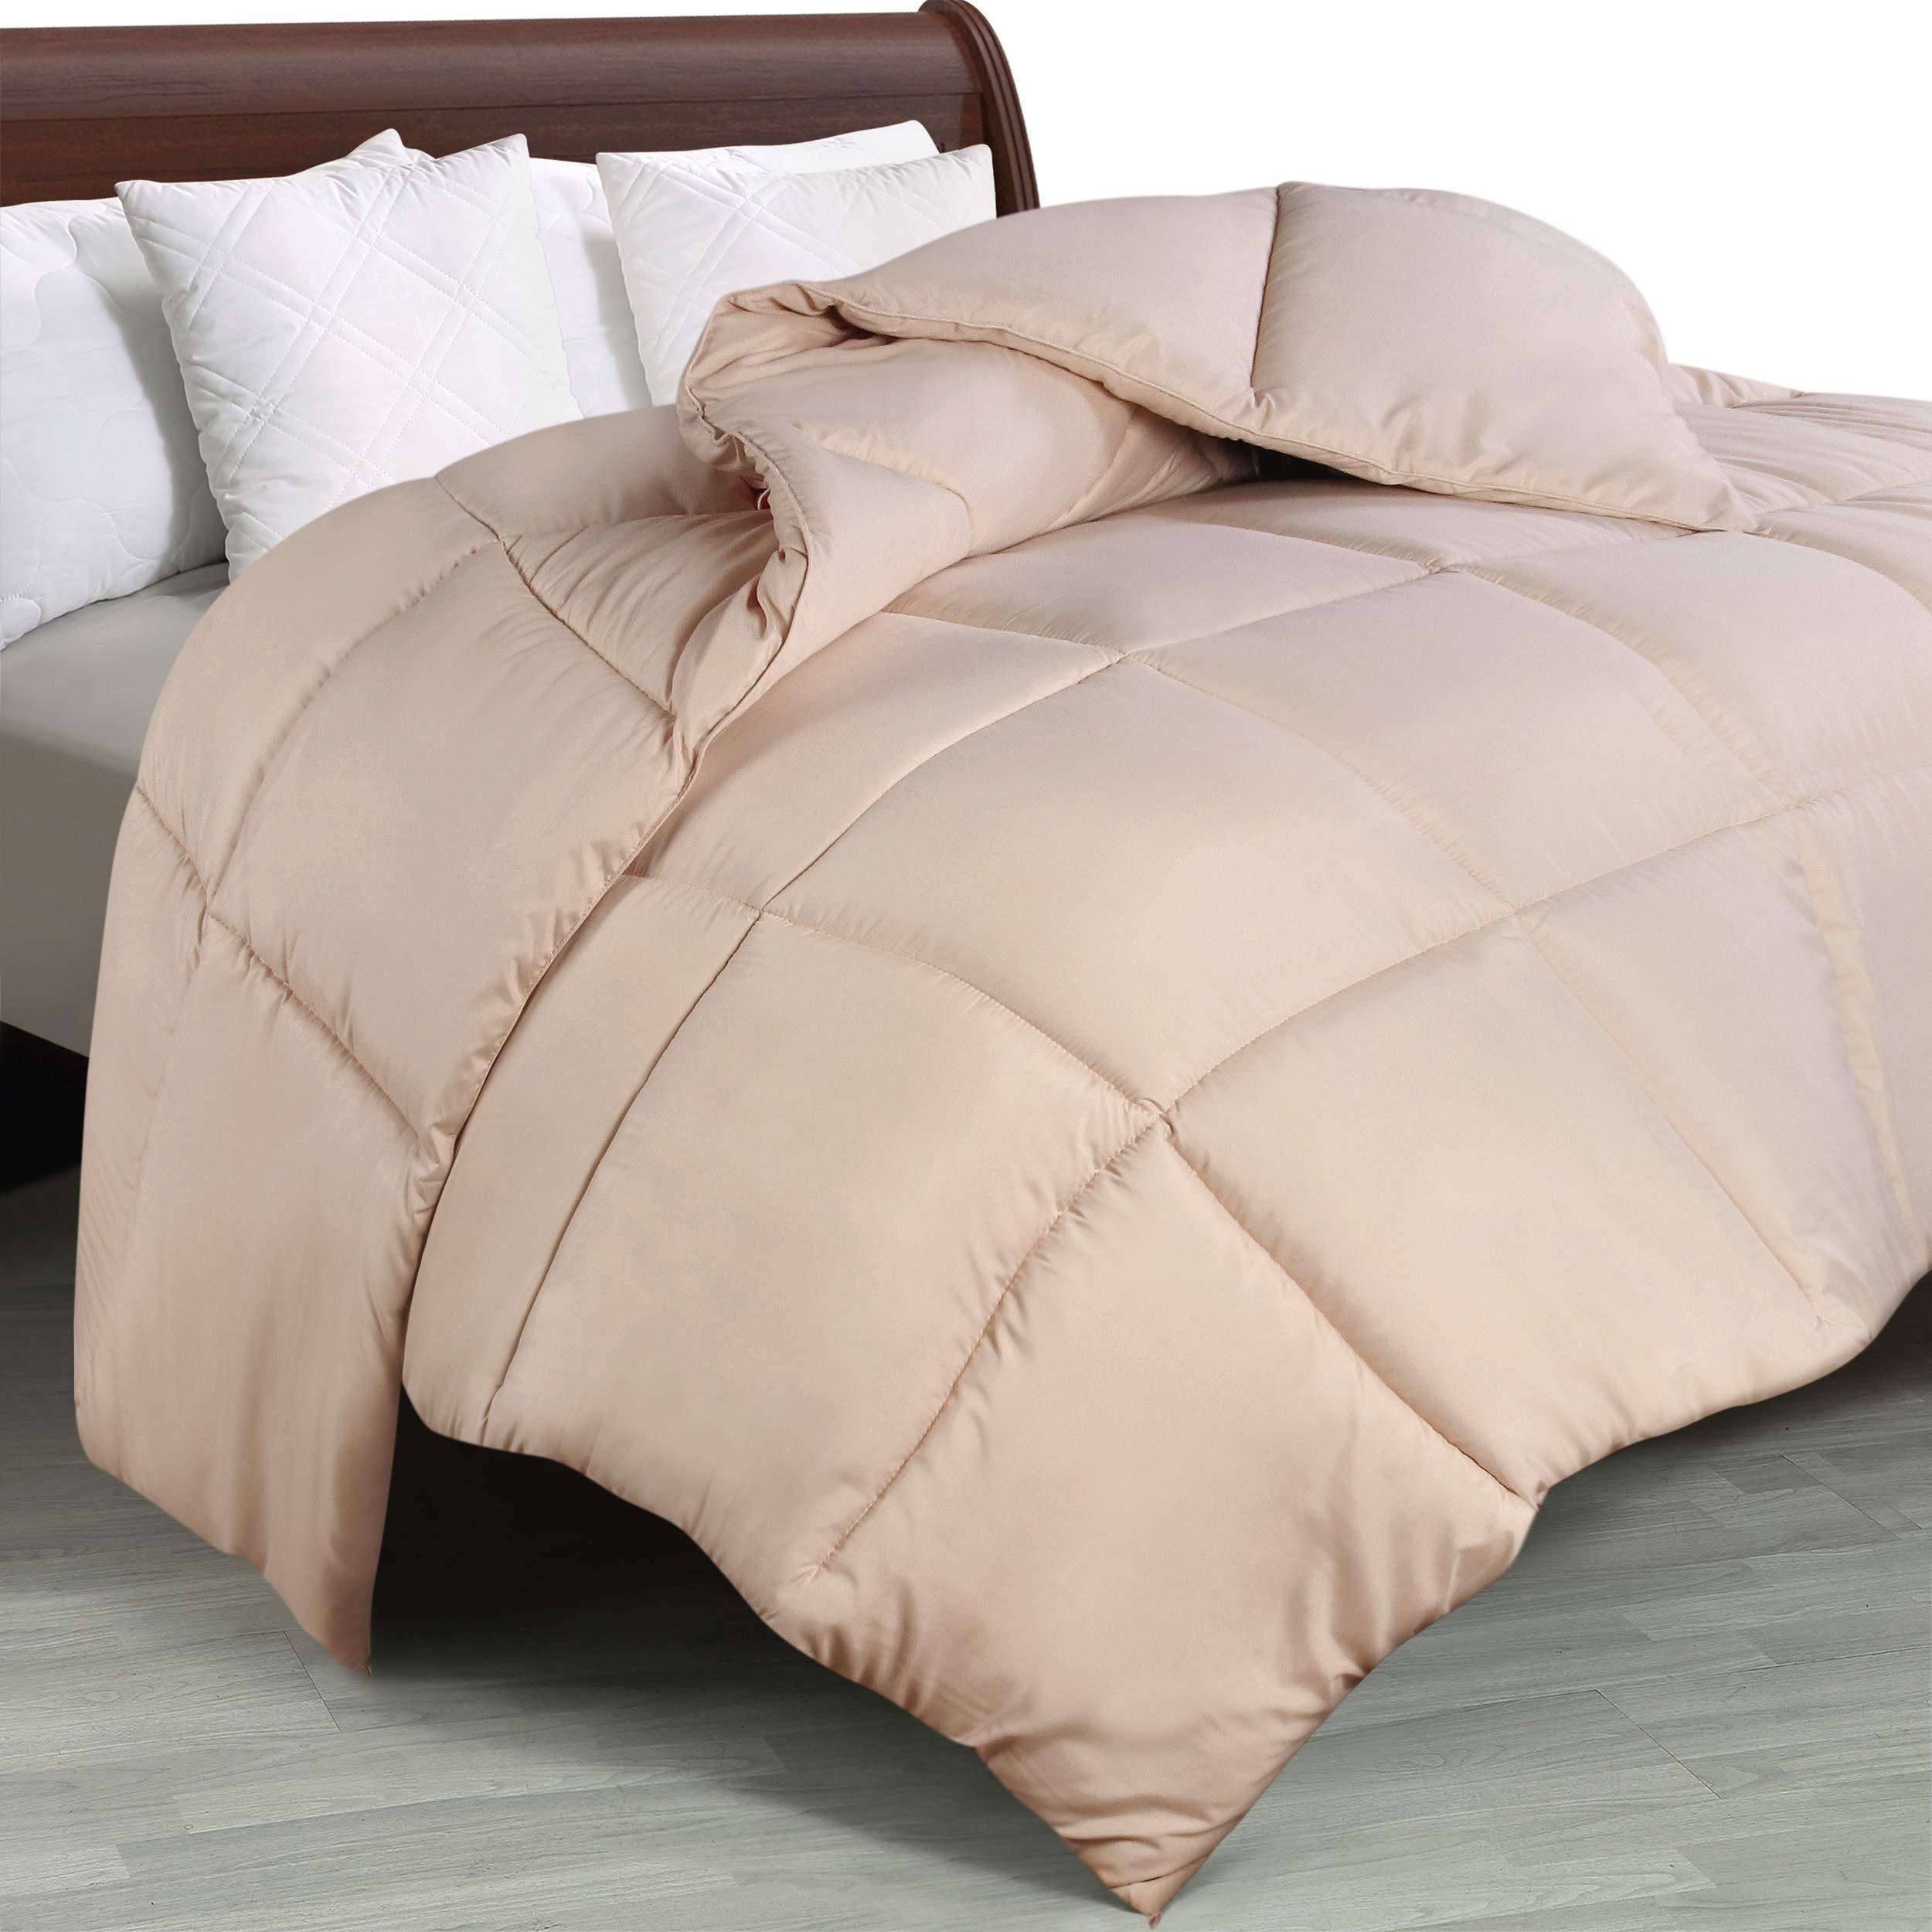 Utopia Bedding Comforter Duvet Insert - Quilted Comforter with Corner Tabs - Box Stitched Down Alternative Comforter (King...